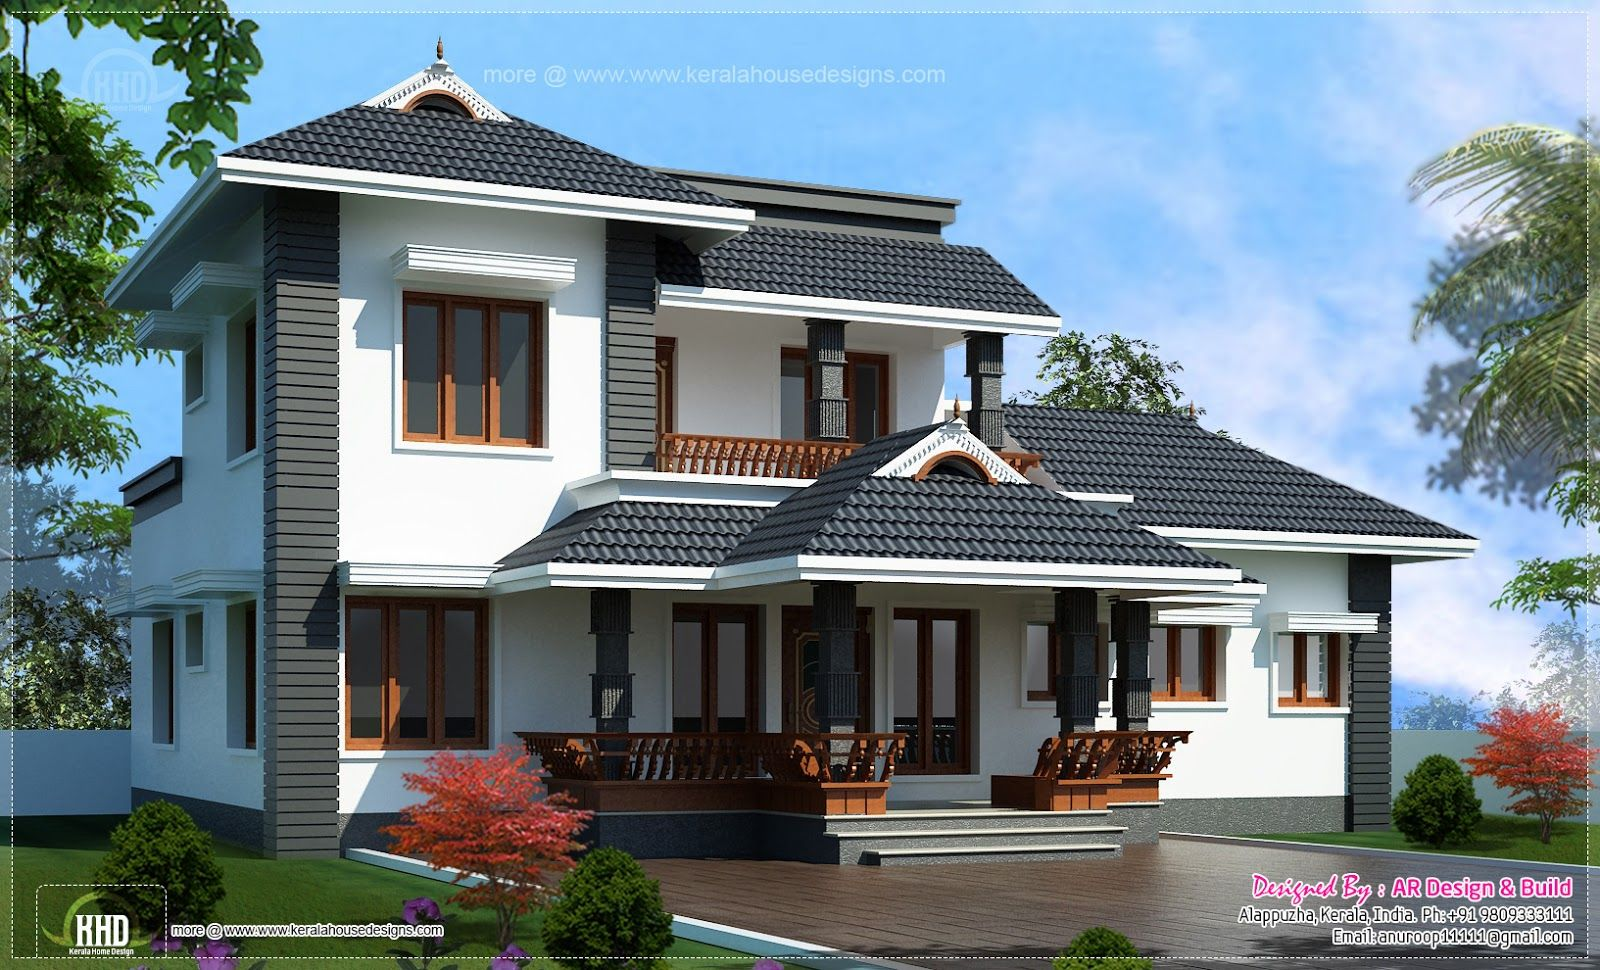 2000 sq.feet 4 bedroom sloping roof residence in 2020